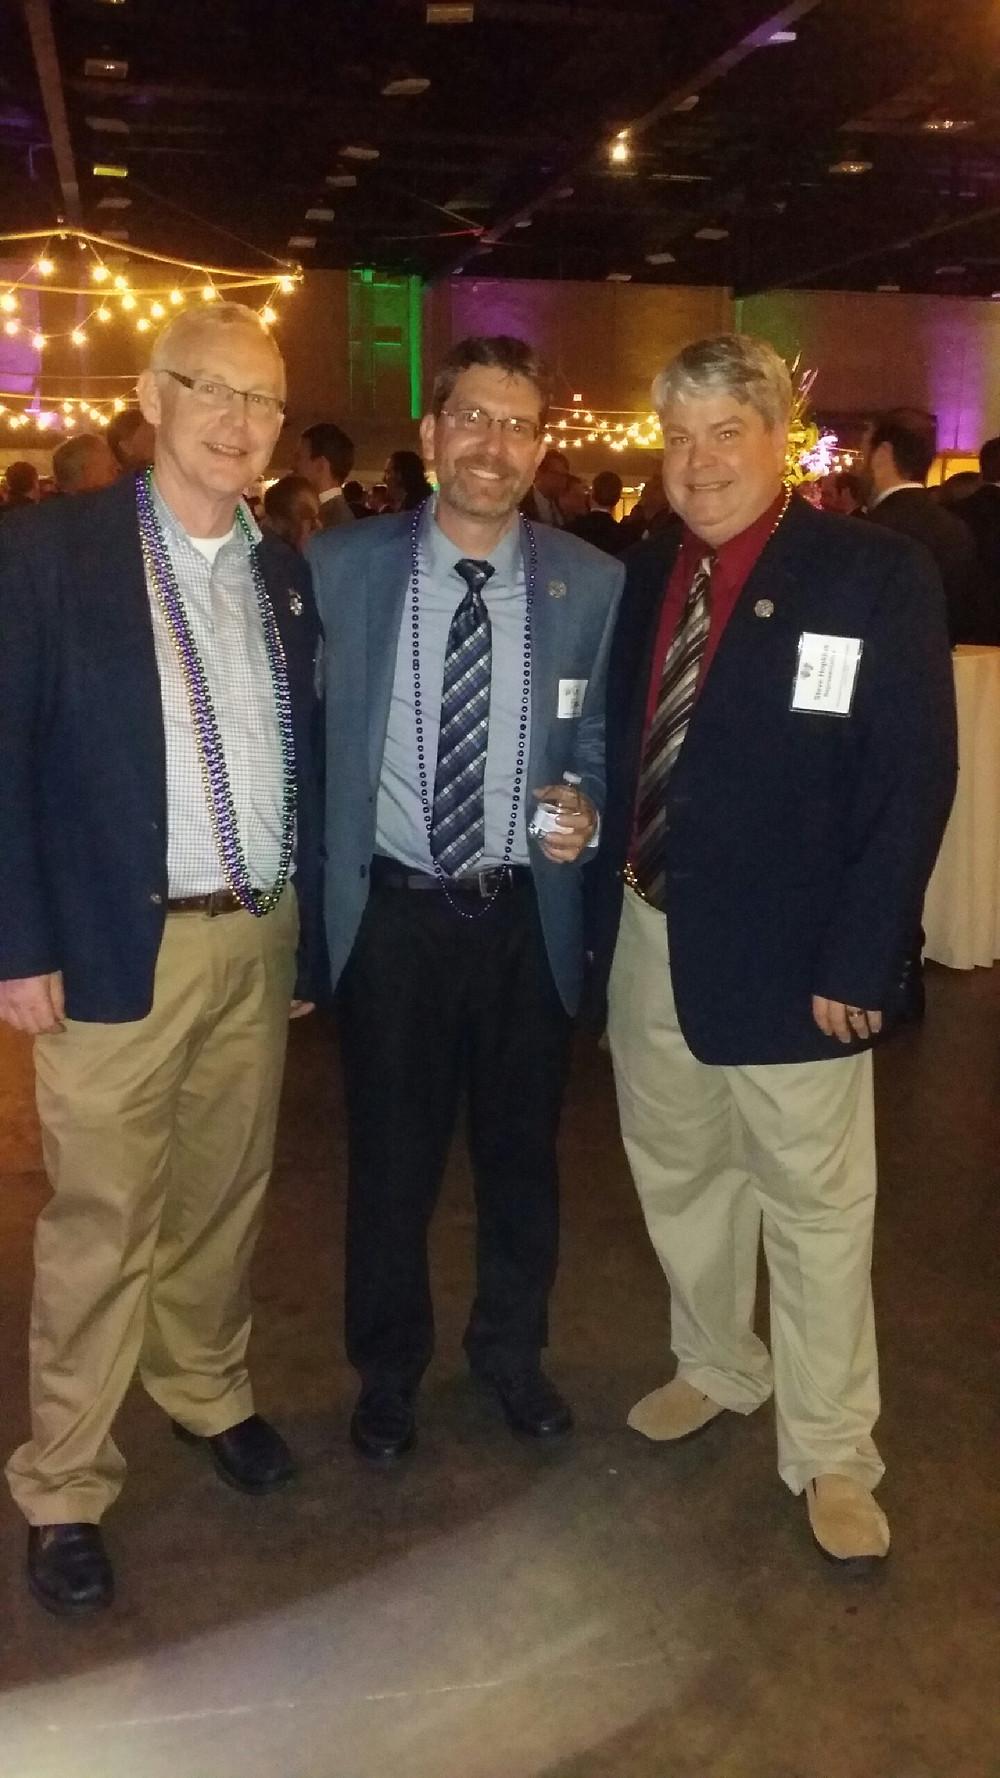 Dana Criswell, me, and Steve Hopkins at the Gulf Coast Legislative Reception.